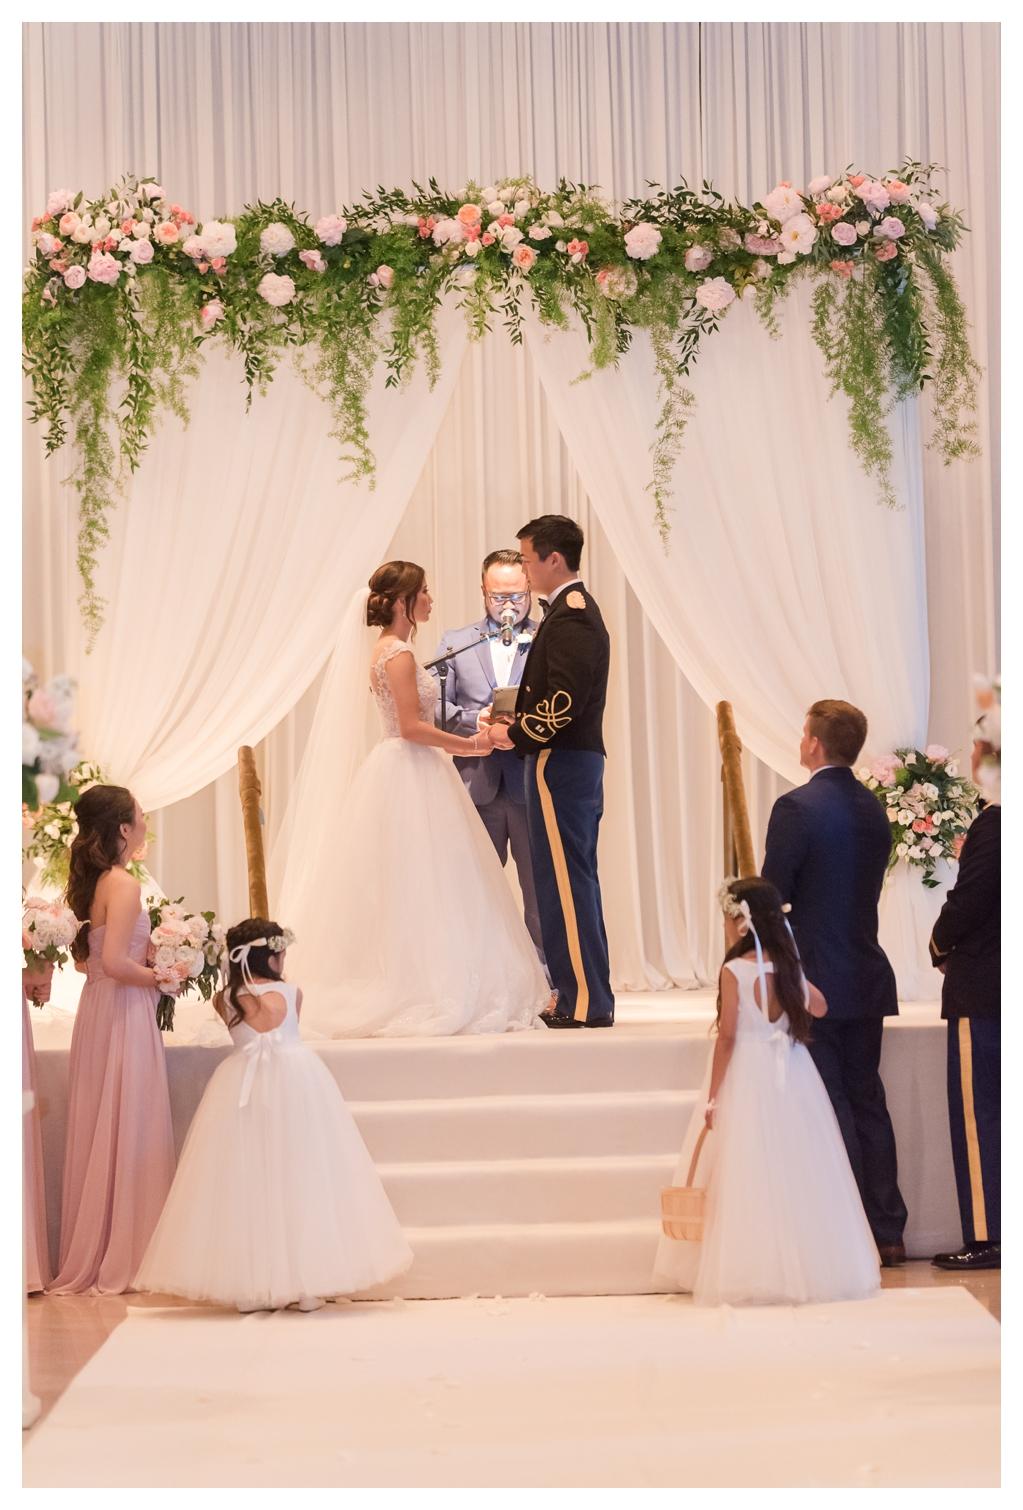 Drake Hotel Gold Coast Room Wedding Ceremony Set Up Options_0410.jpg